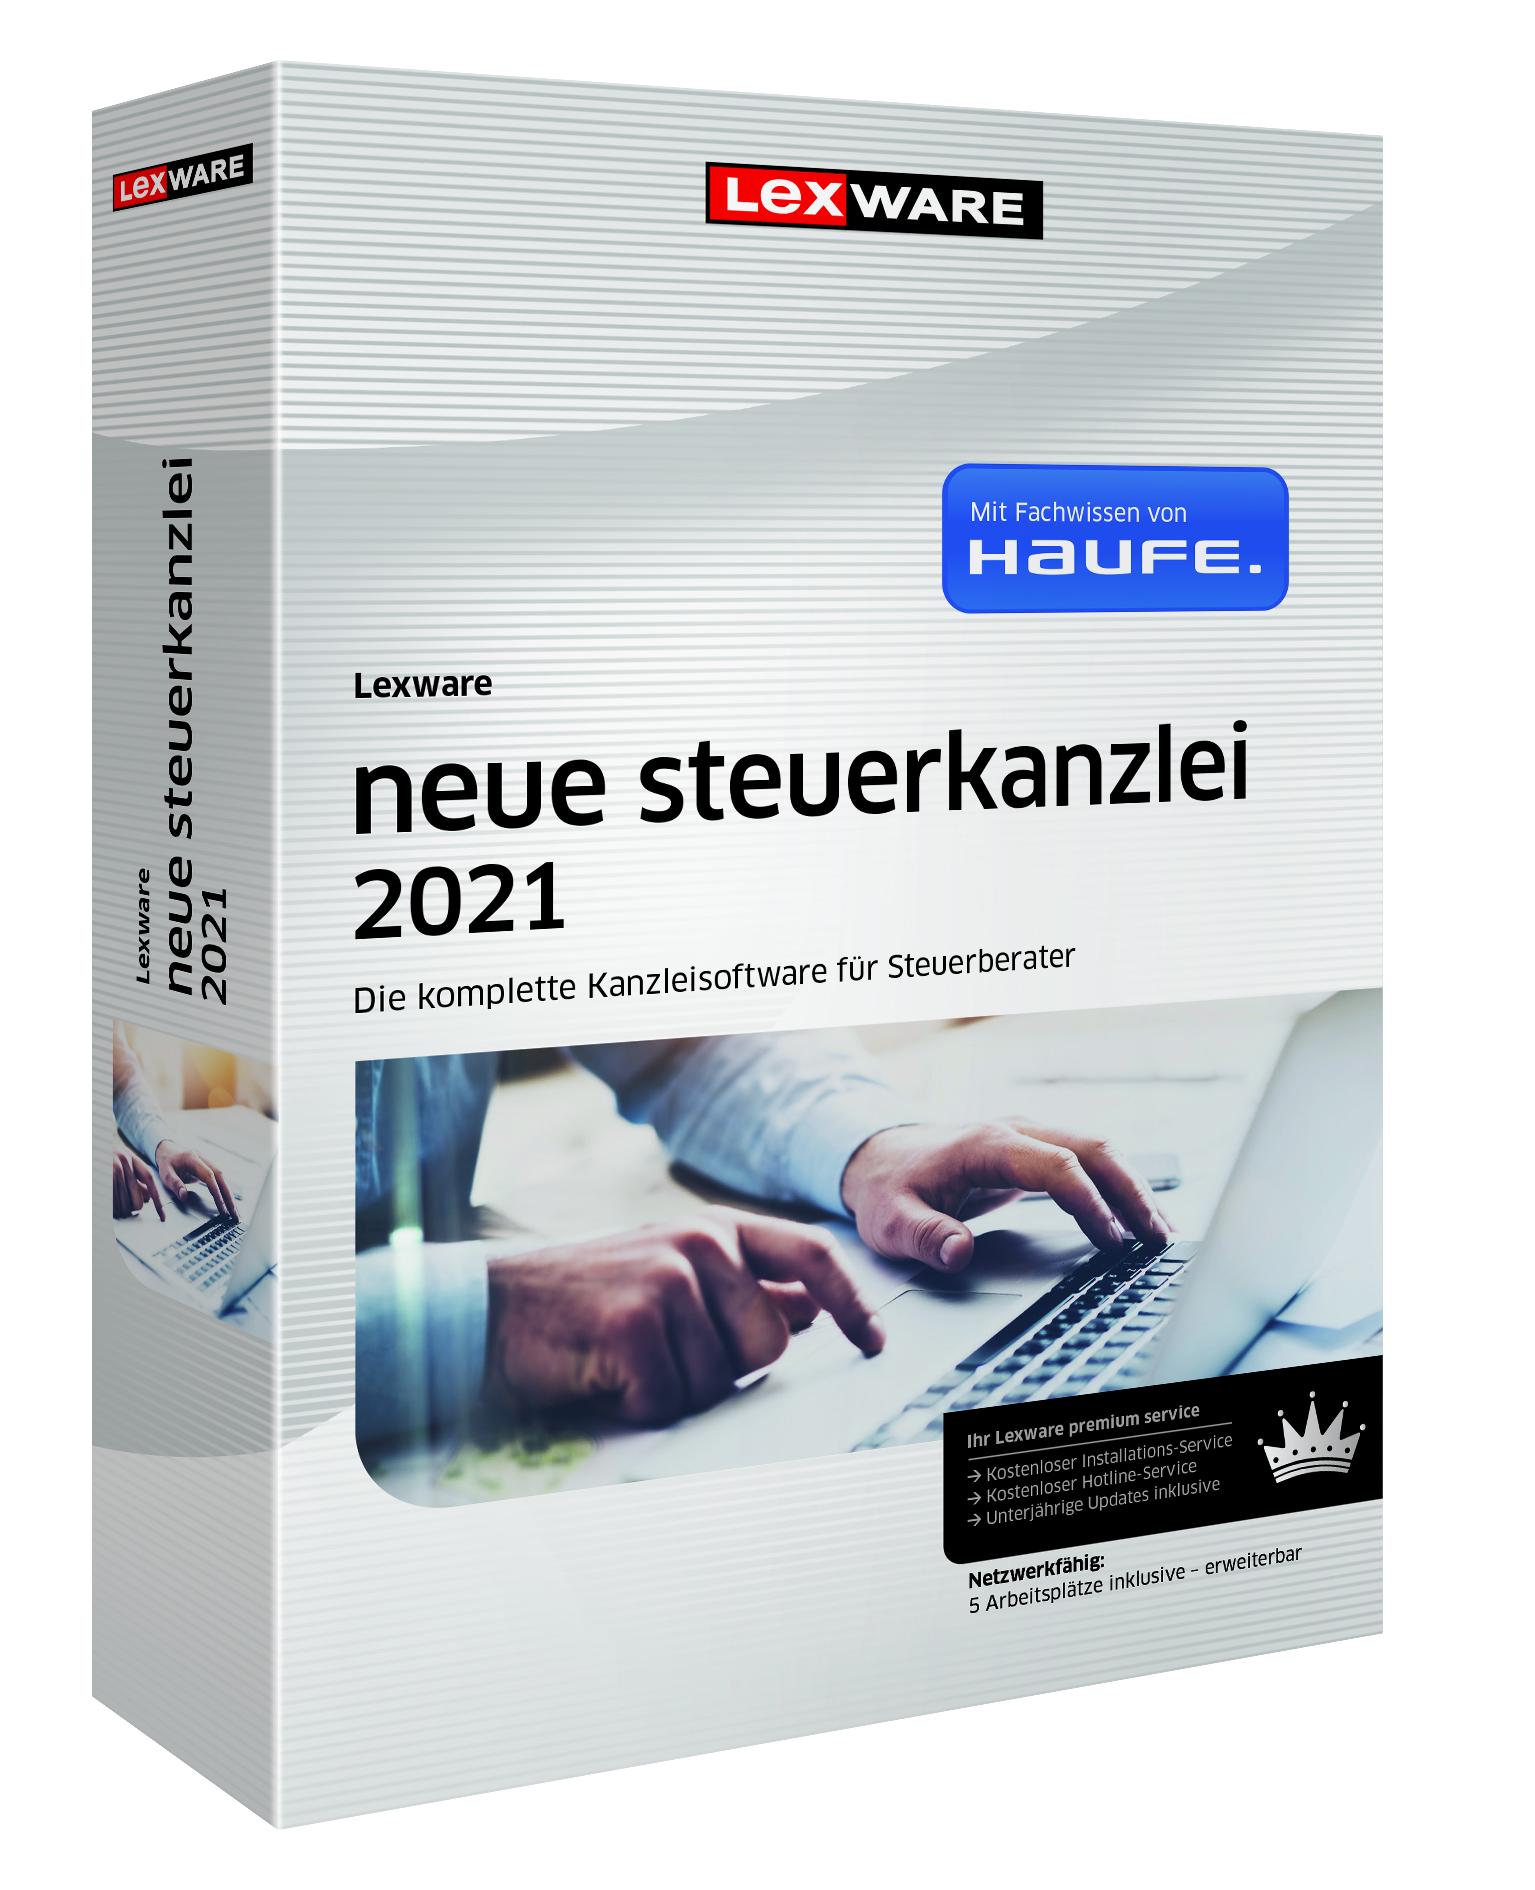 Lexware steuerkanzlei und Lexware Bueroservice